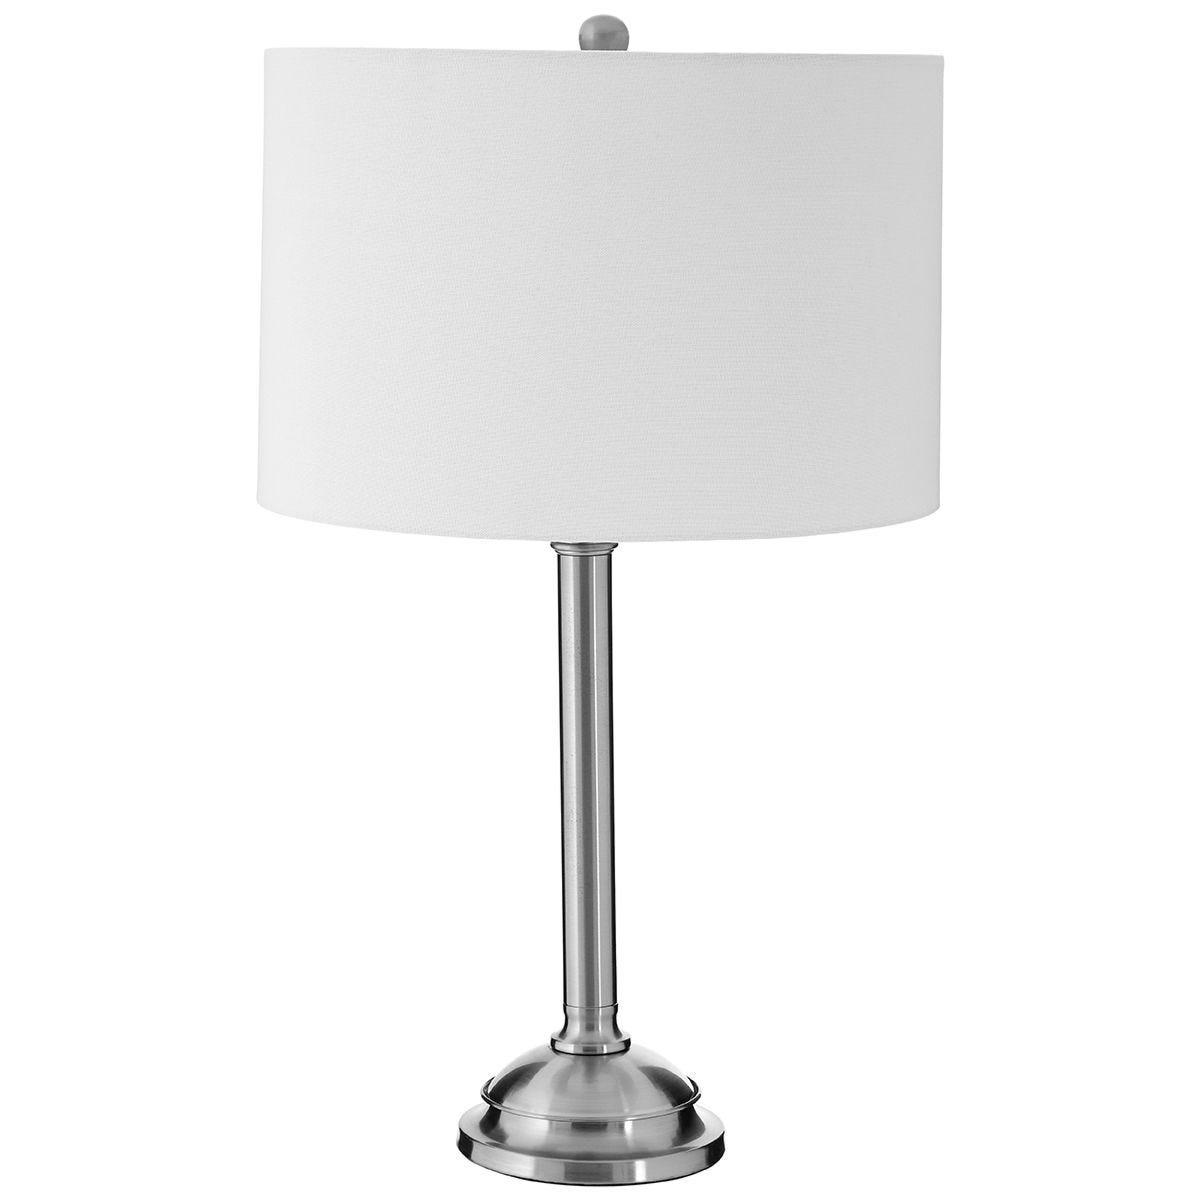 Premier Housewares Portobello Table Lamp with Metal Base & Cream Shade